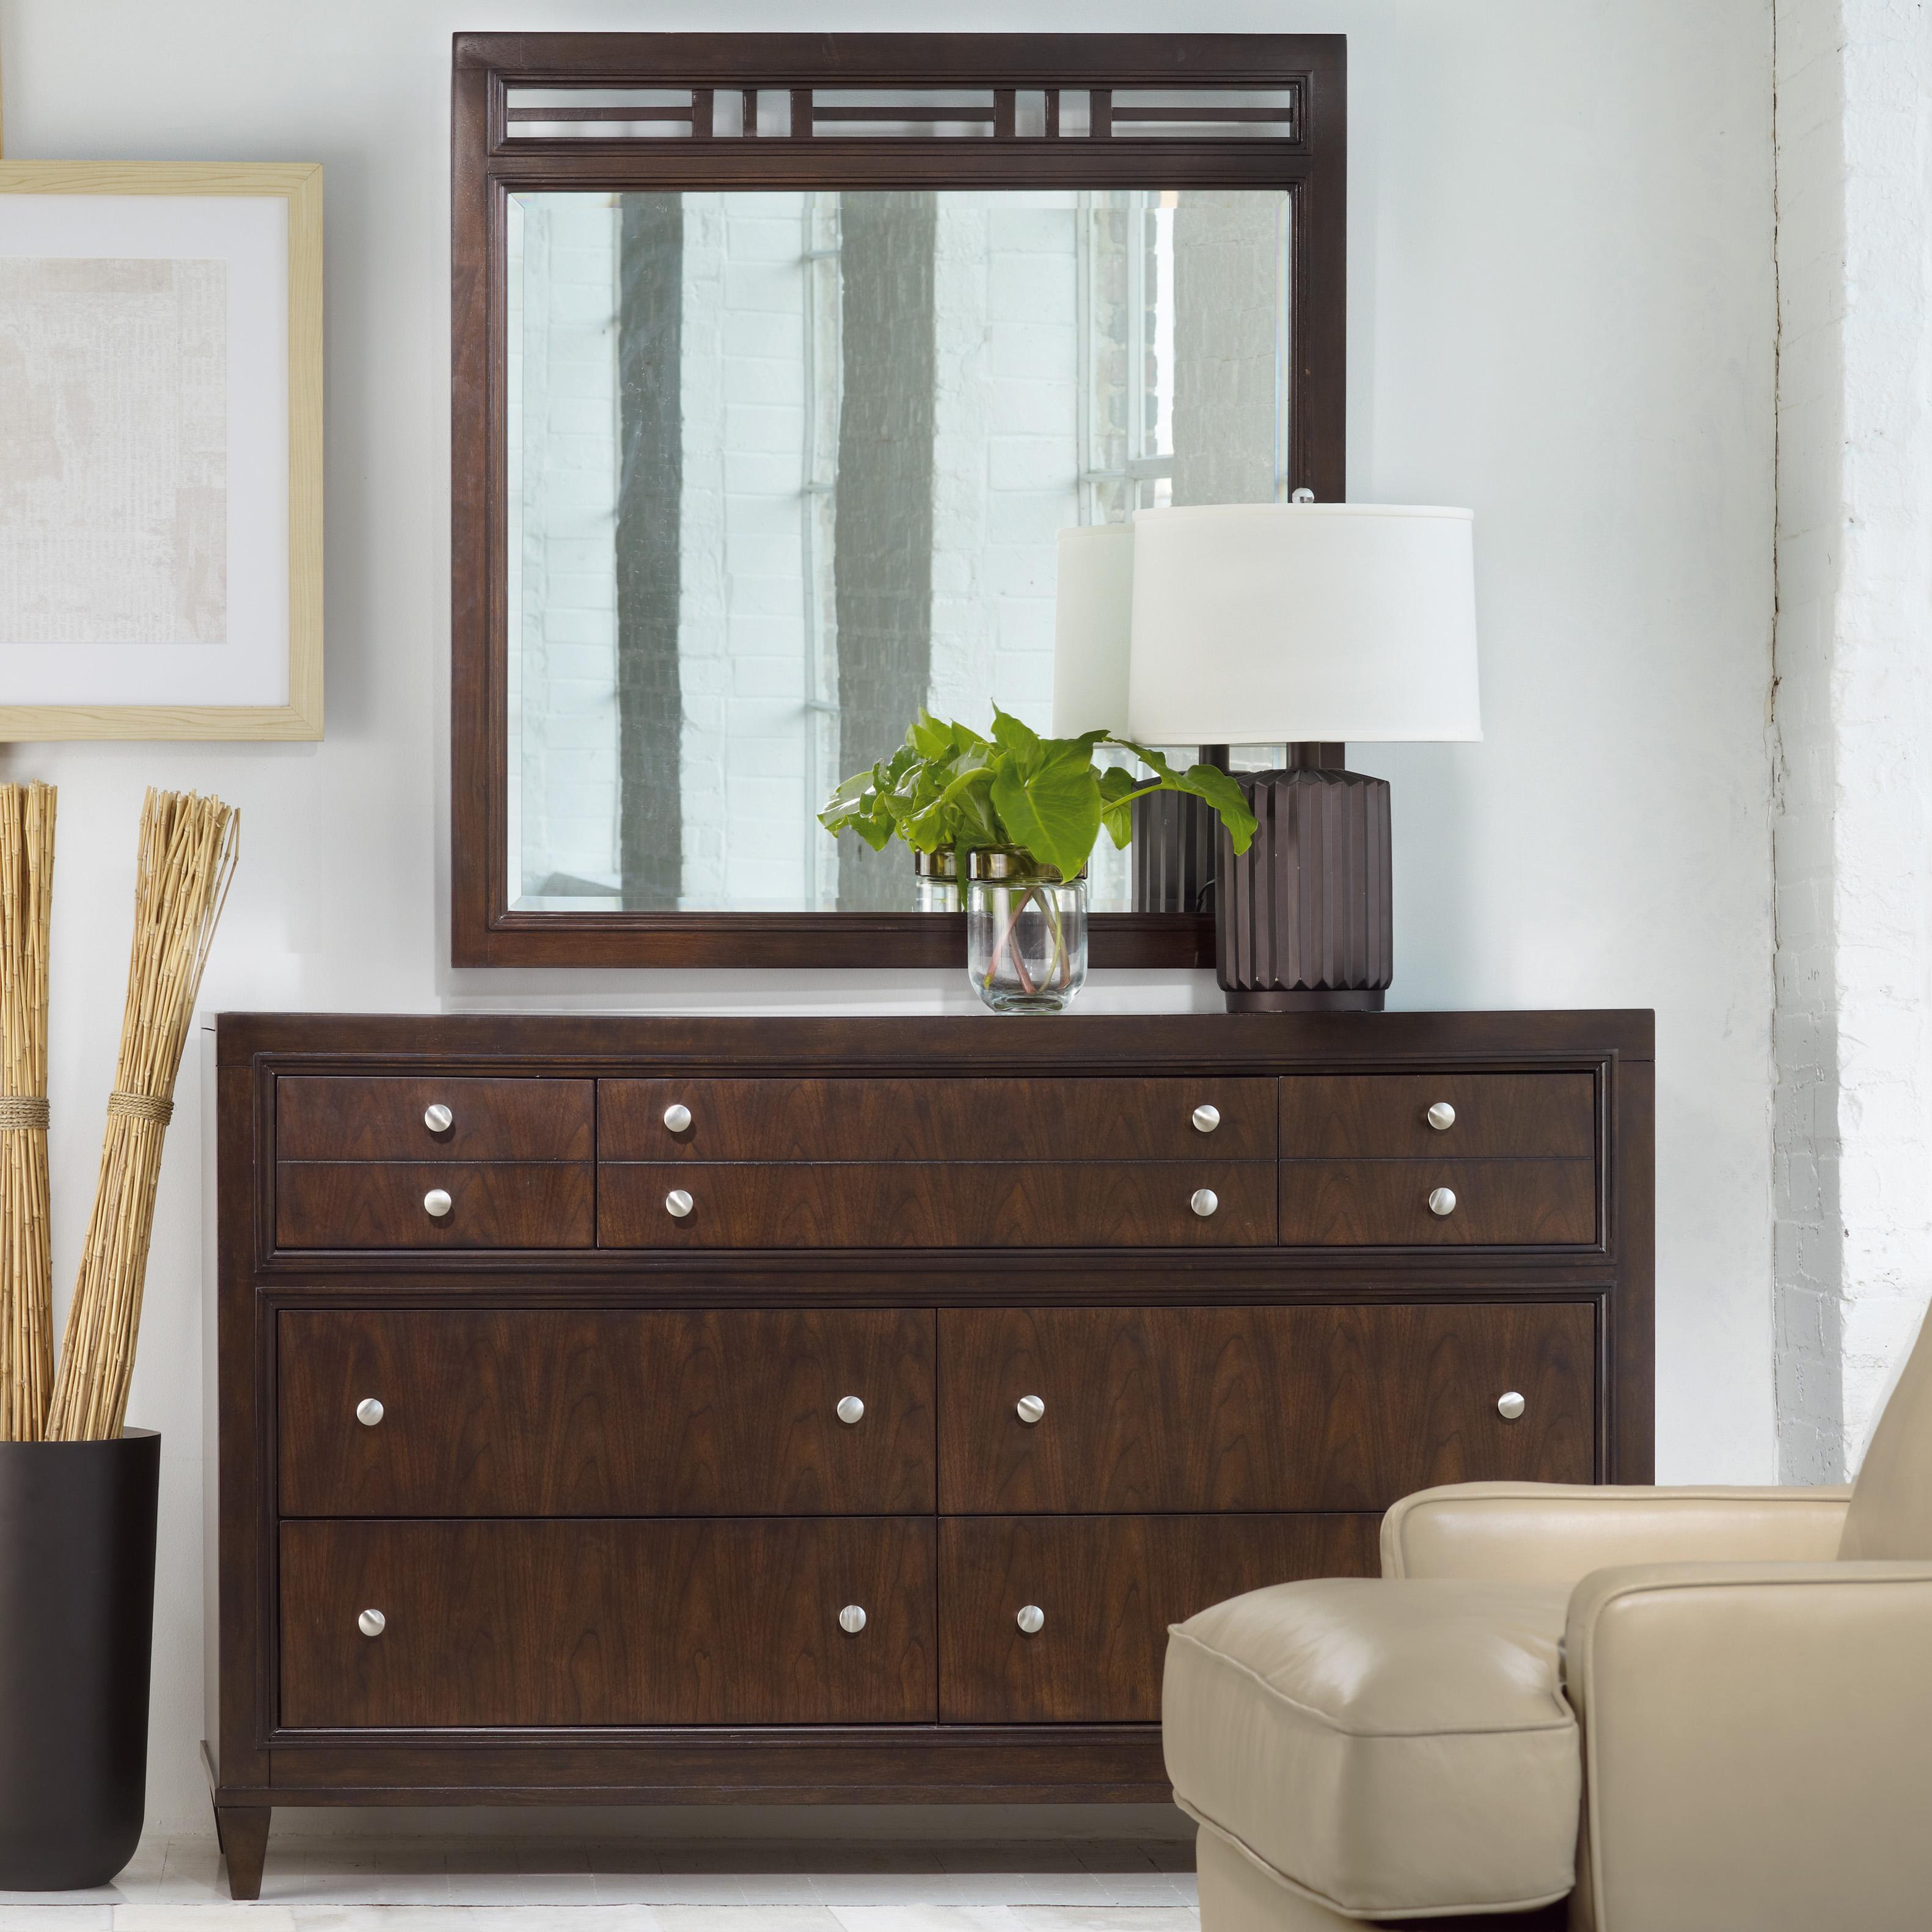 Hooker Furniture Ludlow Dresser & Mirror - Item Number: 1030-91002+91009